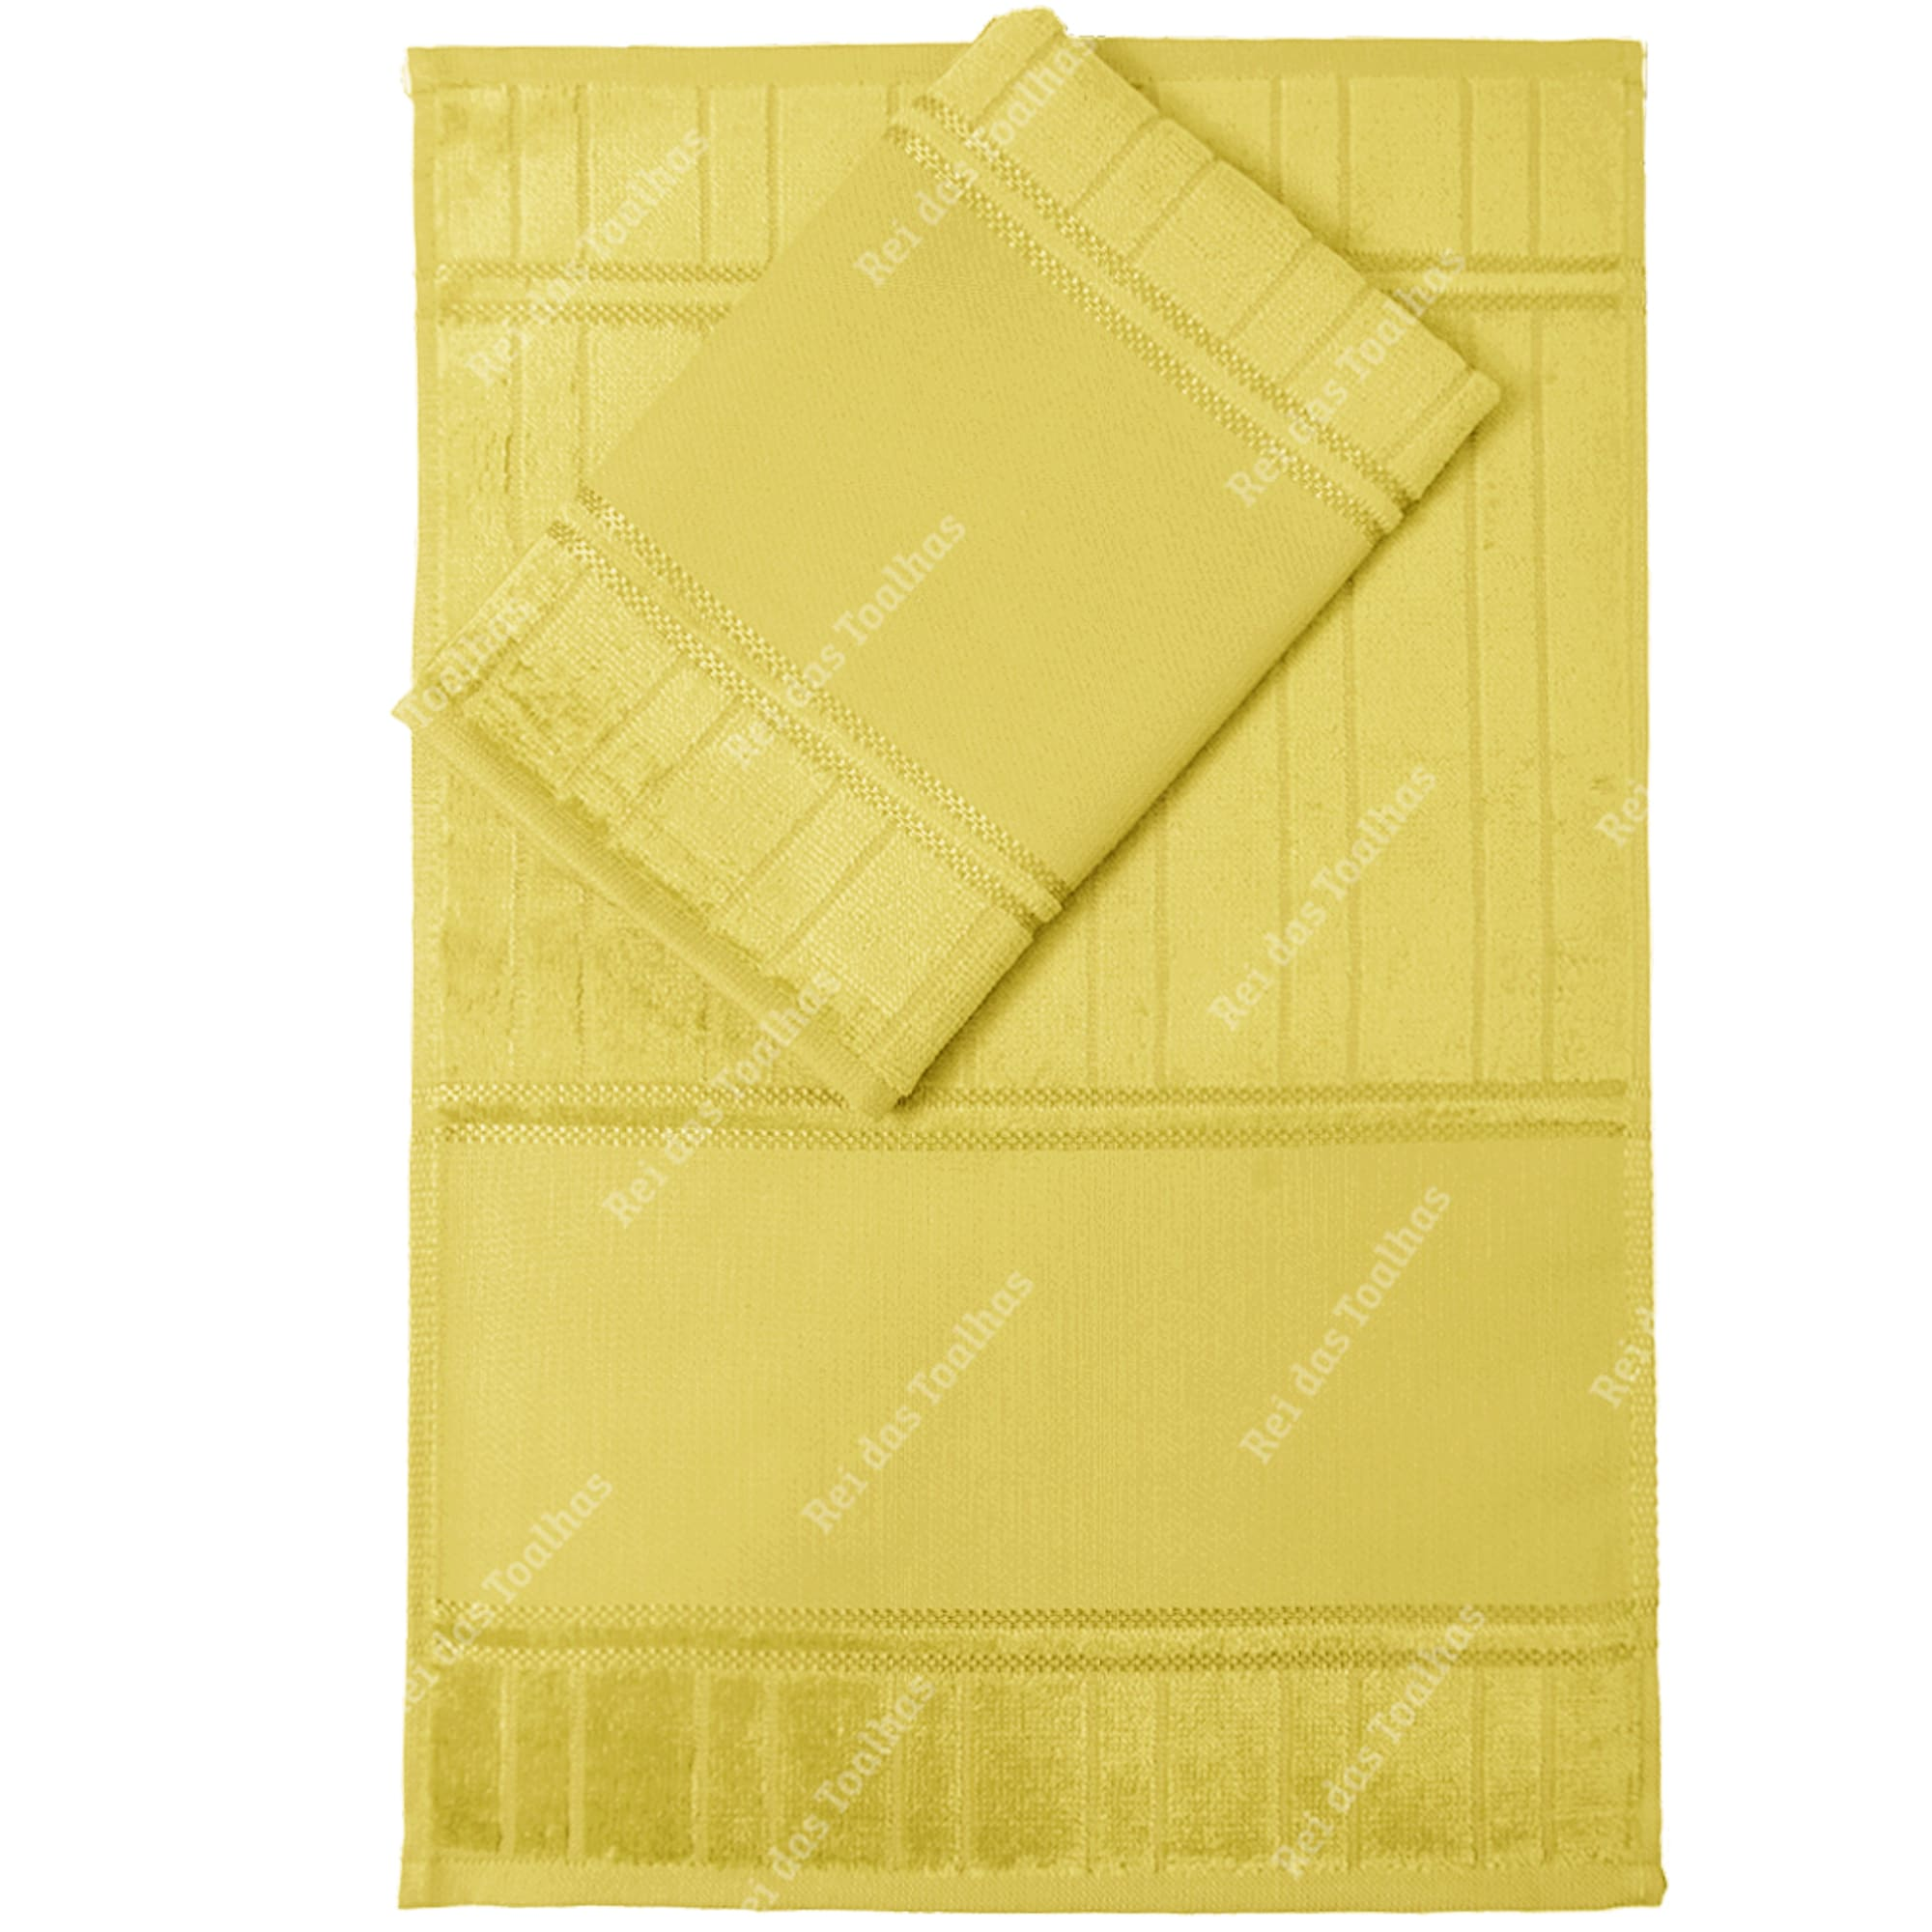 Lavabo Para Pintar Velour Artesanalle 30X45cm DOHLER